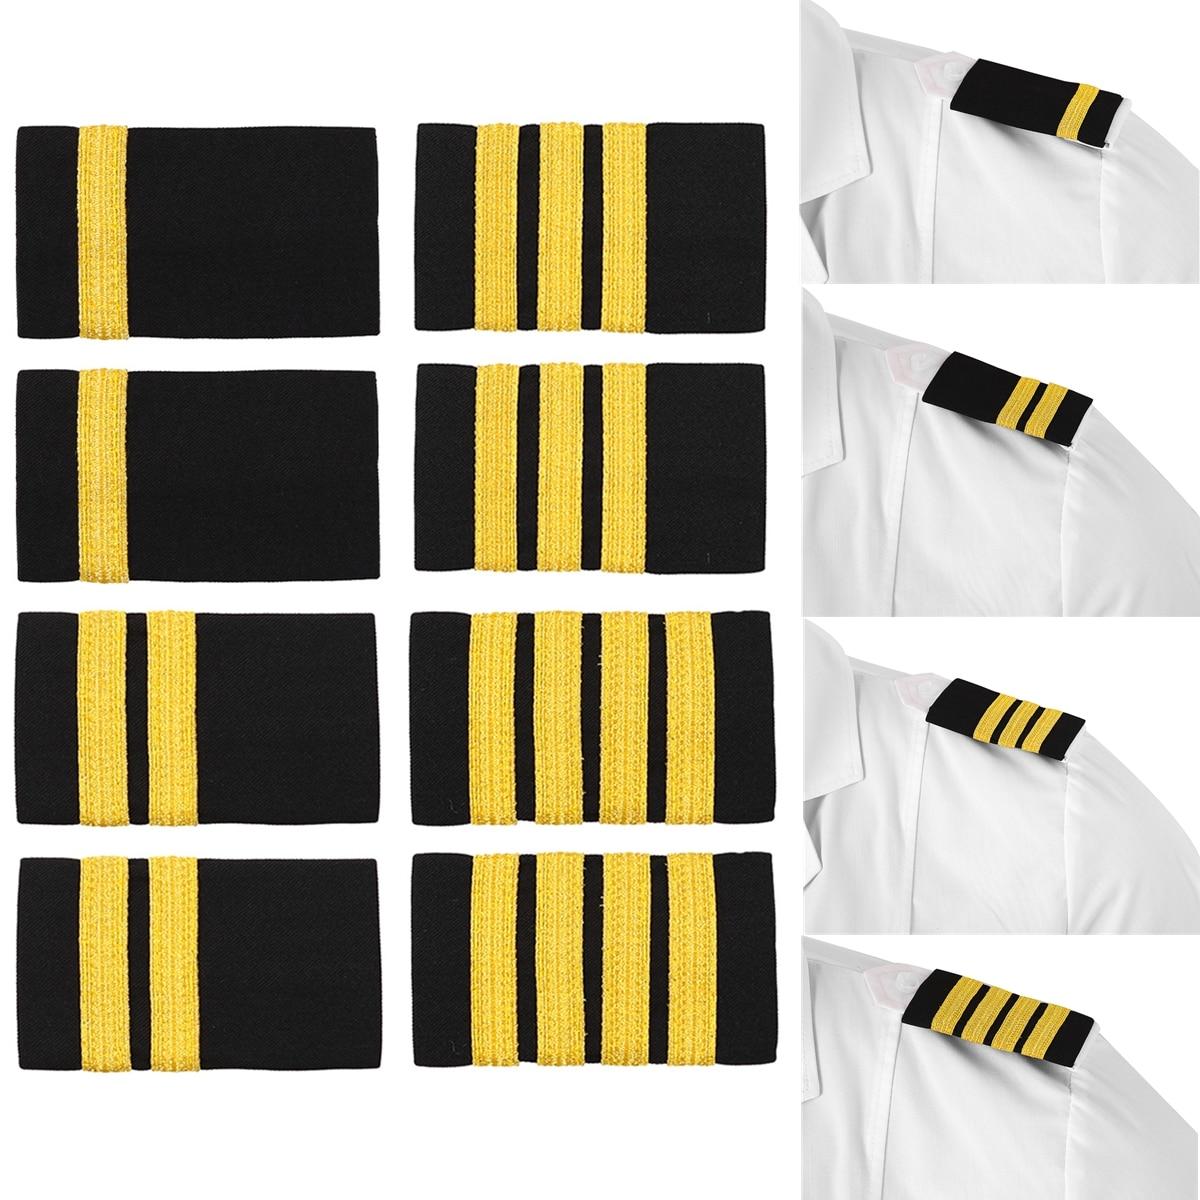 1 Pair Clothing Decor Epaulettes Professional Pilots Uniform Epaulets Bars Shirts Craft Shoulder Badges Garment DIY Accessory